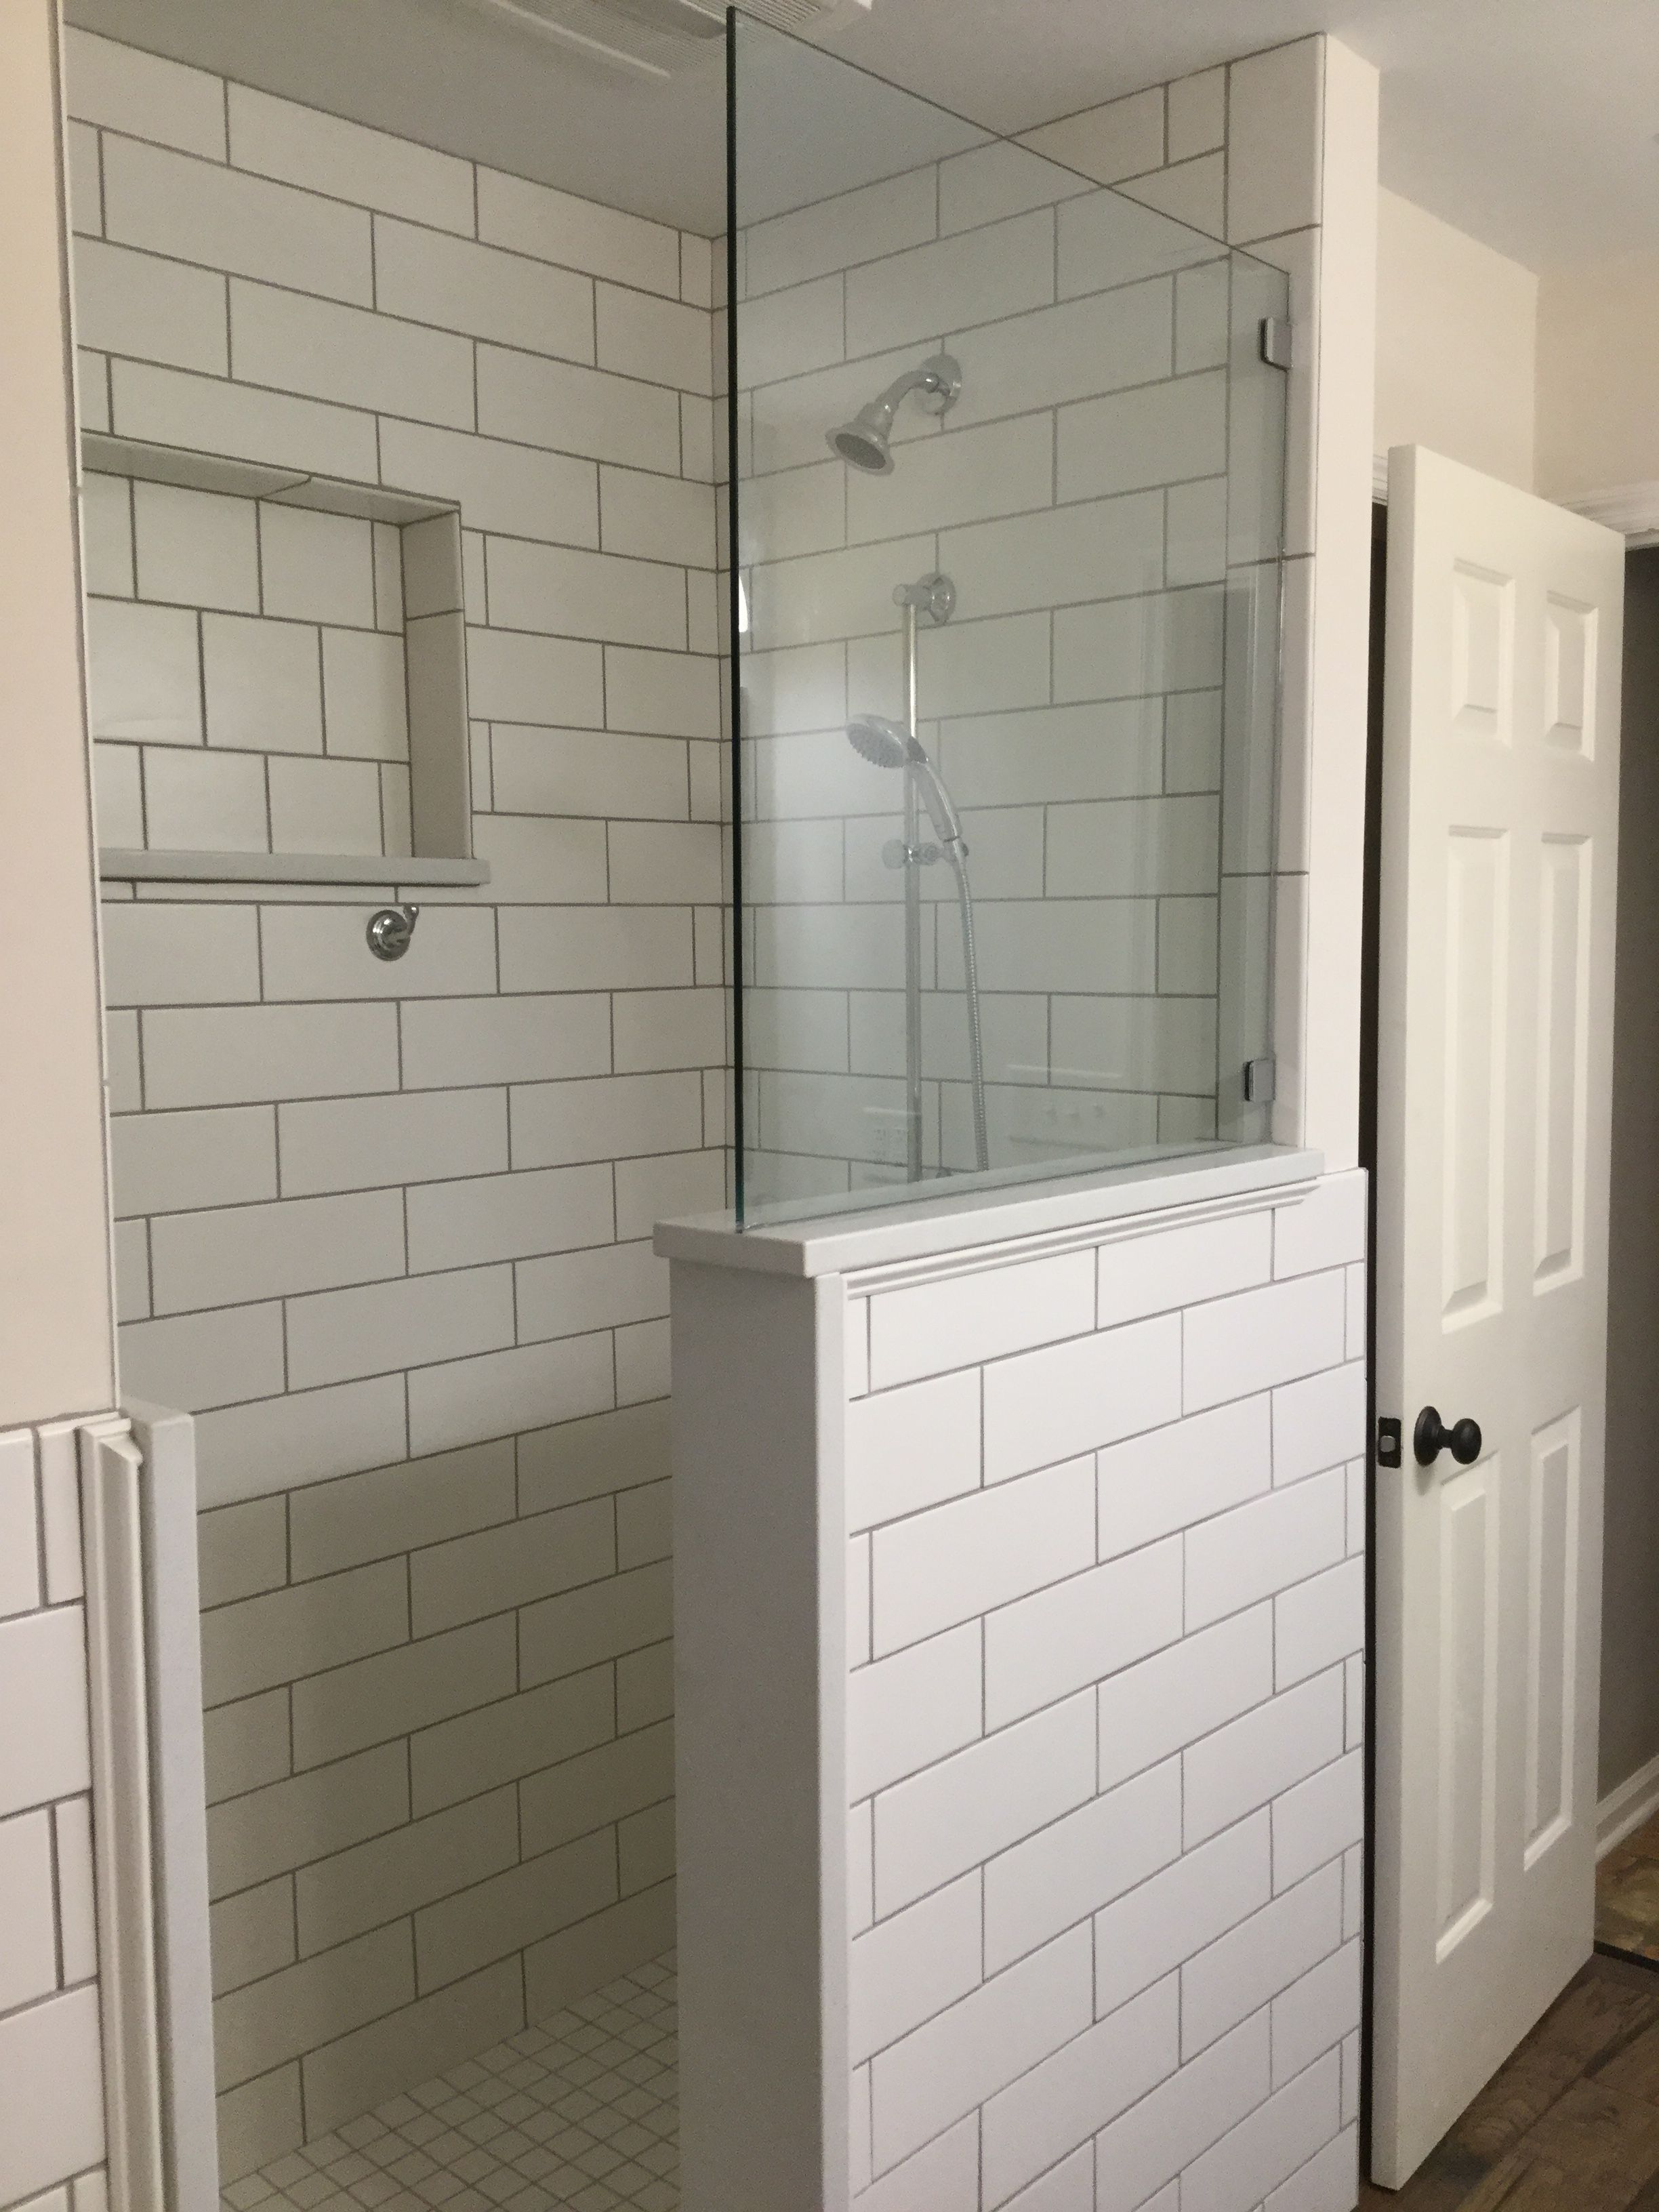 Classic White 4x6 Subway Tiled Shower Extra Large Cutout